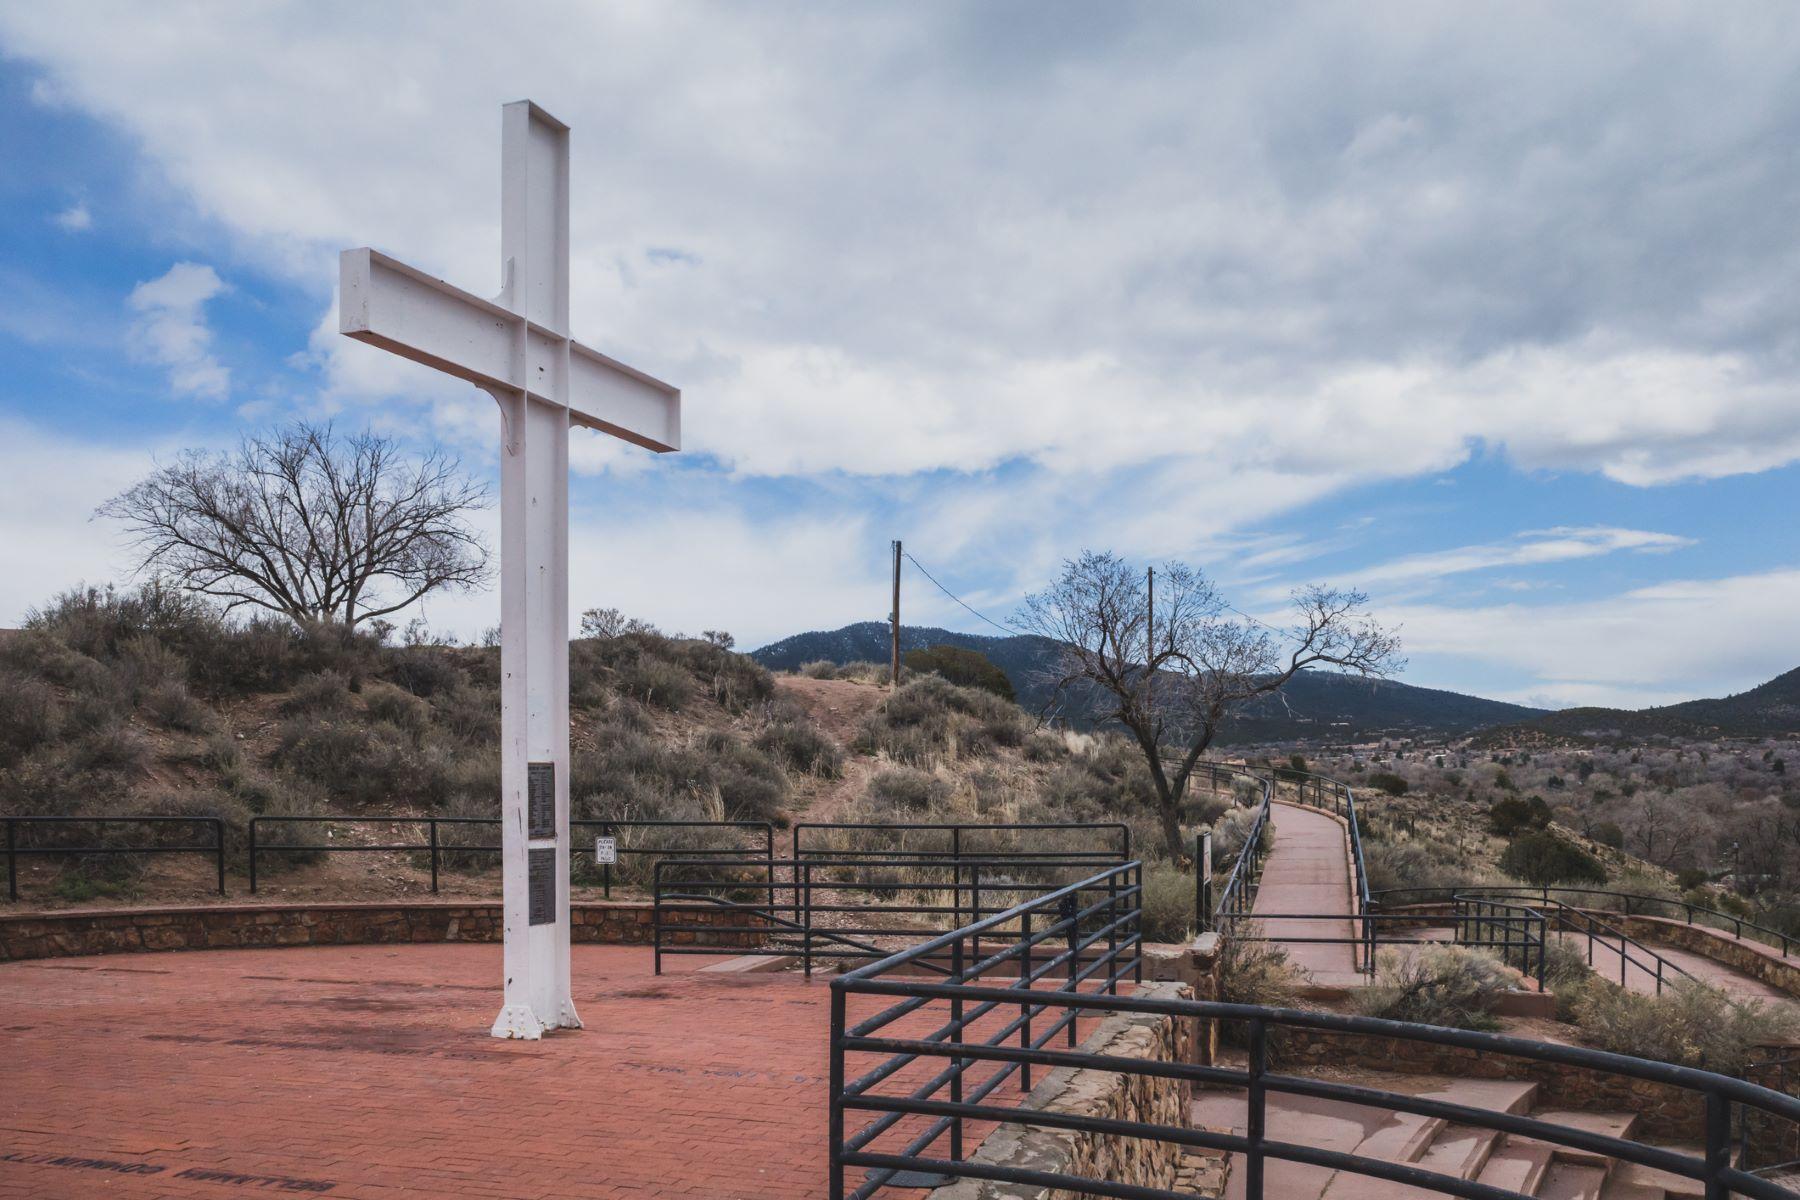 Cross of the Martyrs Santa Fe